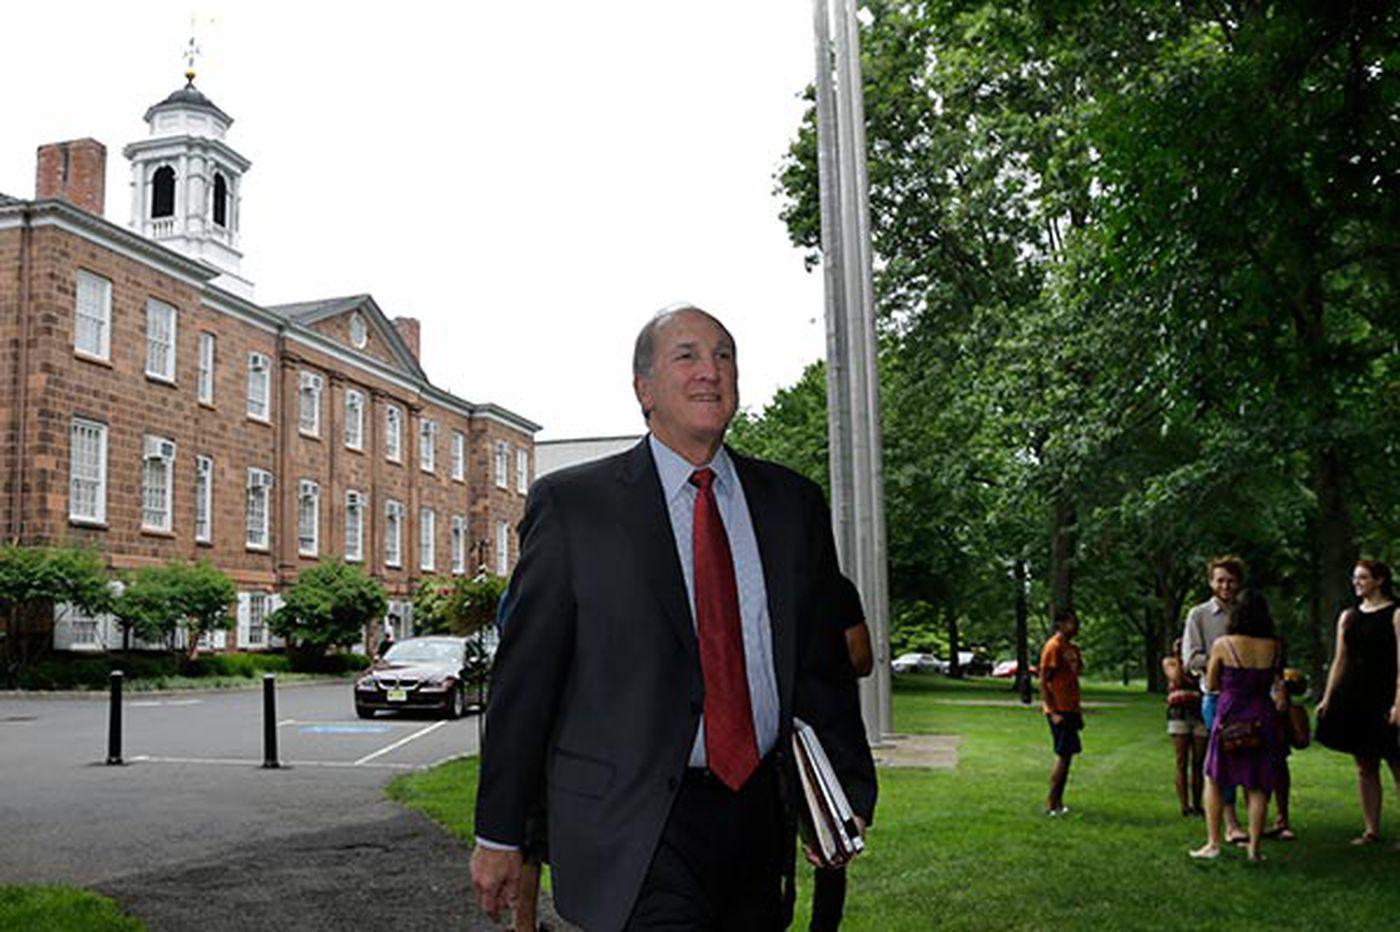 Rutgers president describes university's health